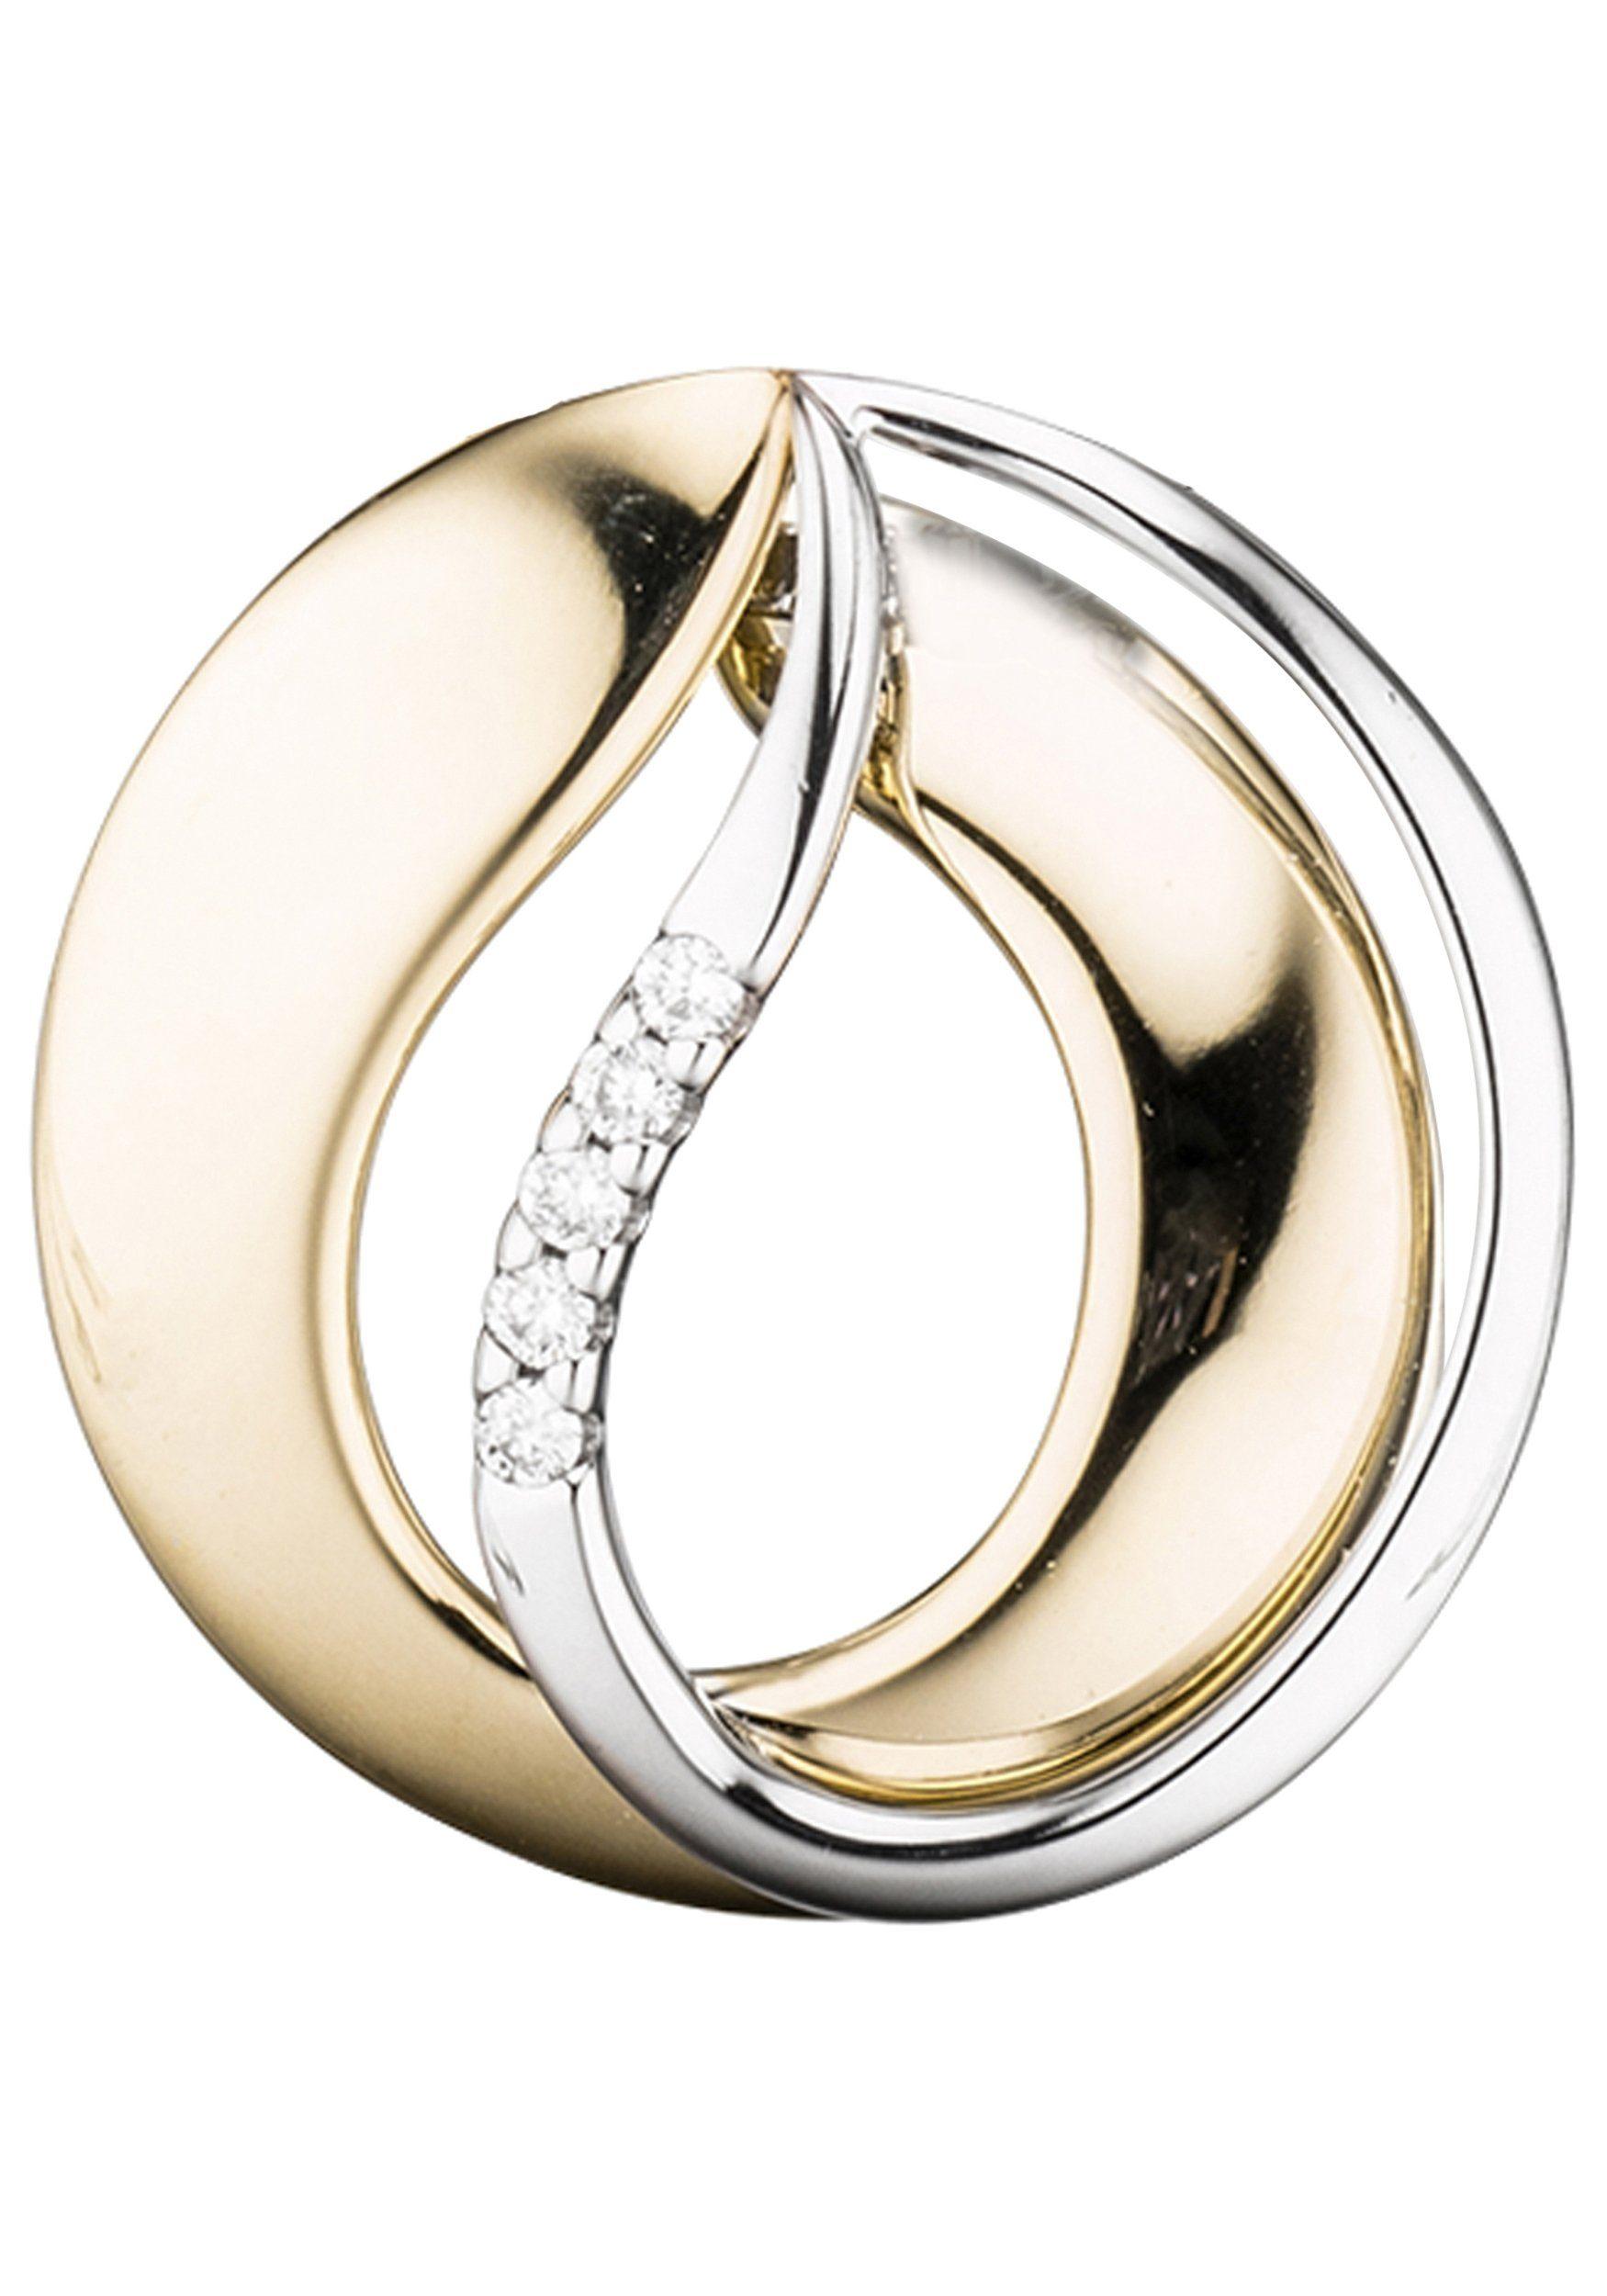 JOBO Kettenanhänger 585 Gold bicolor mit 5 Diamanten